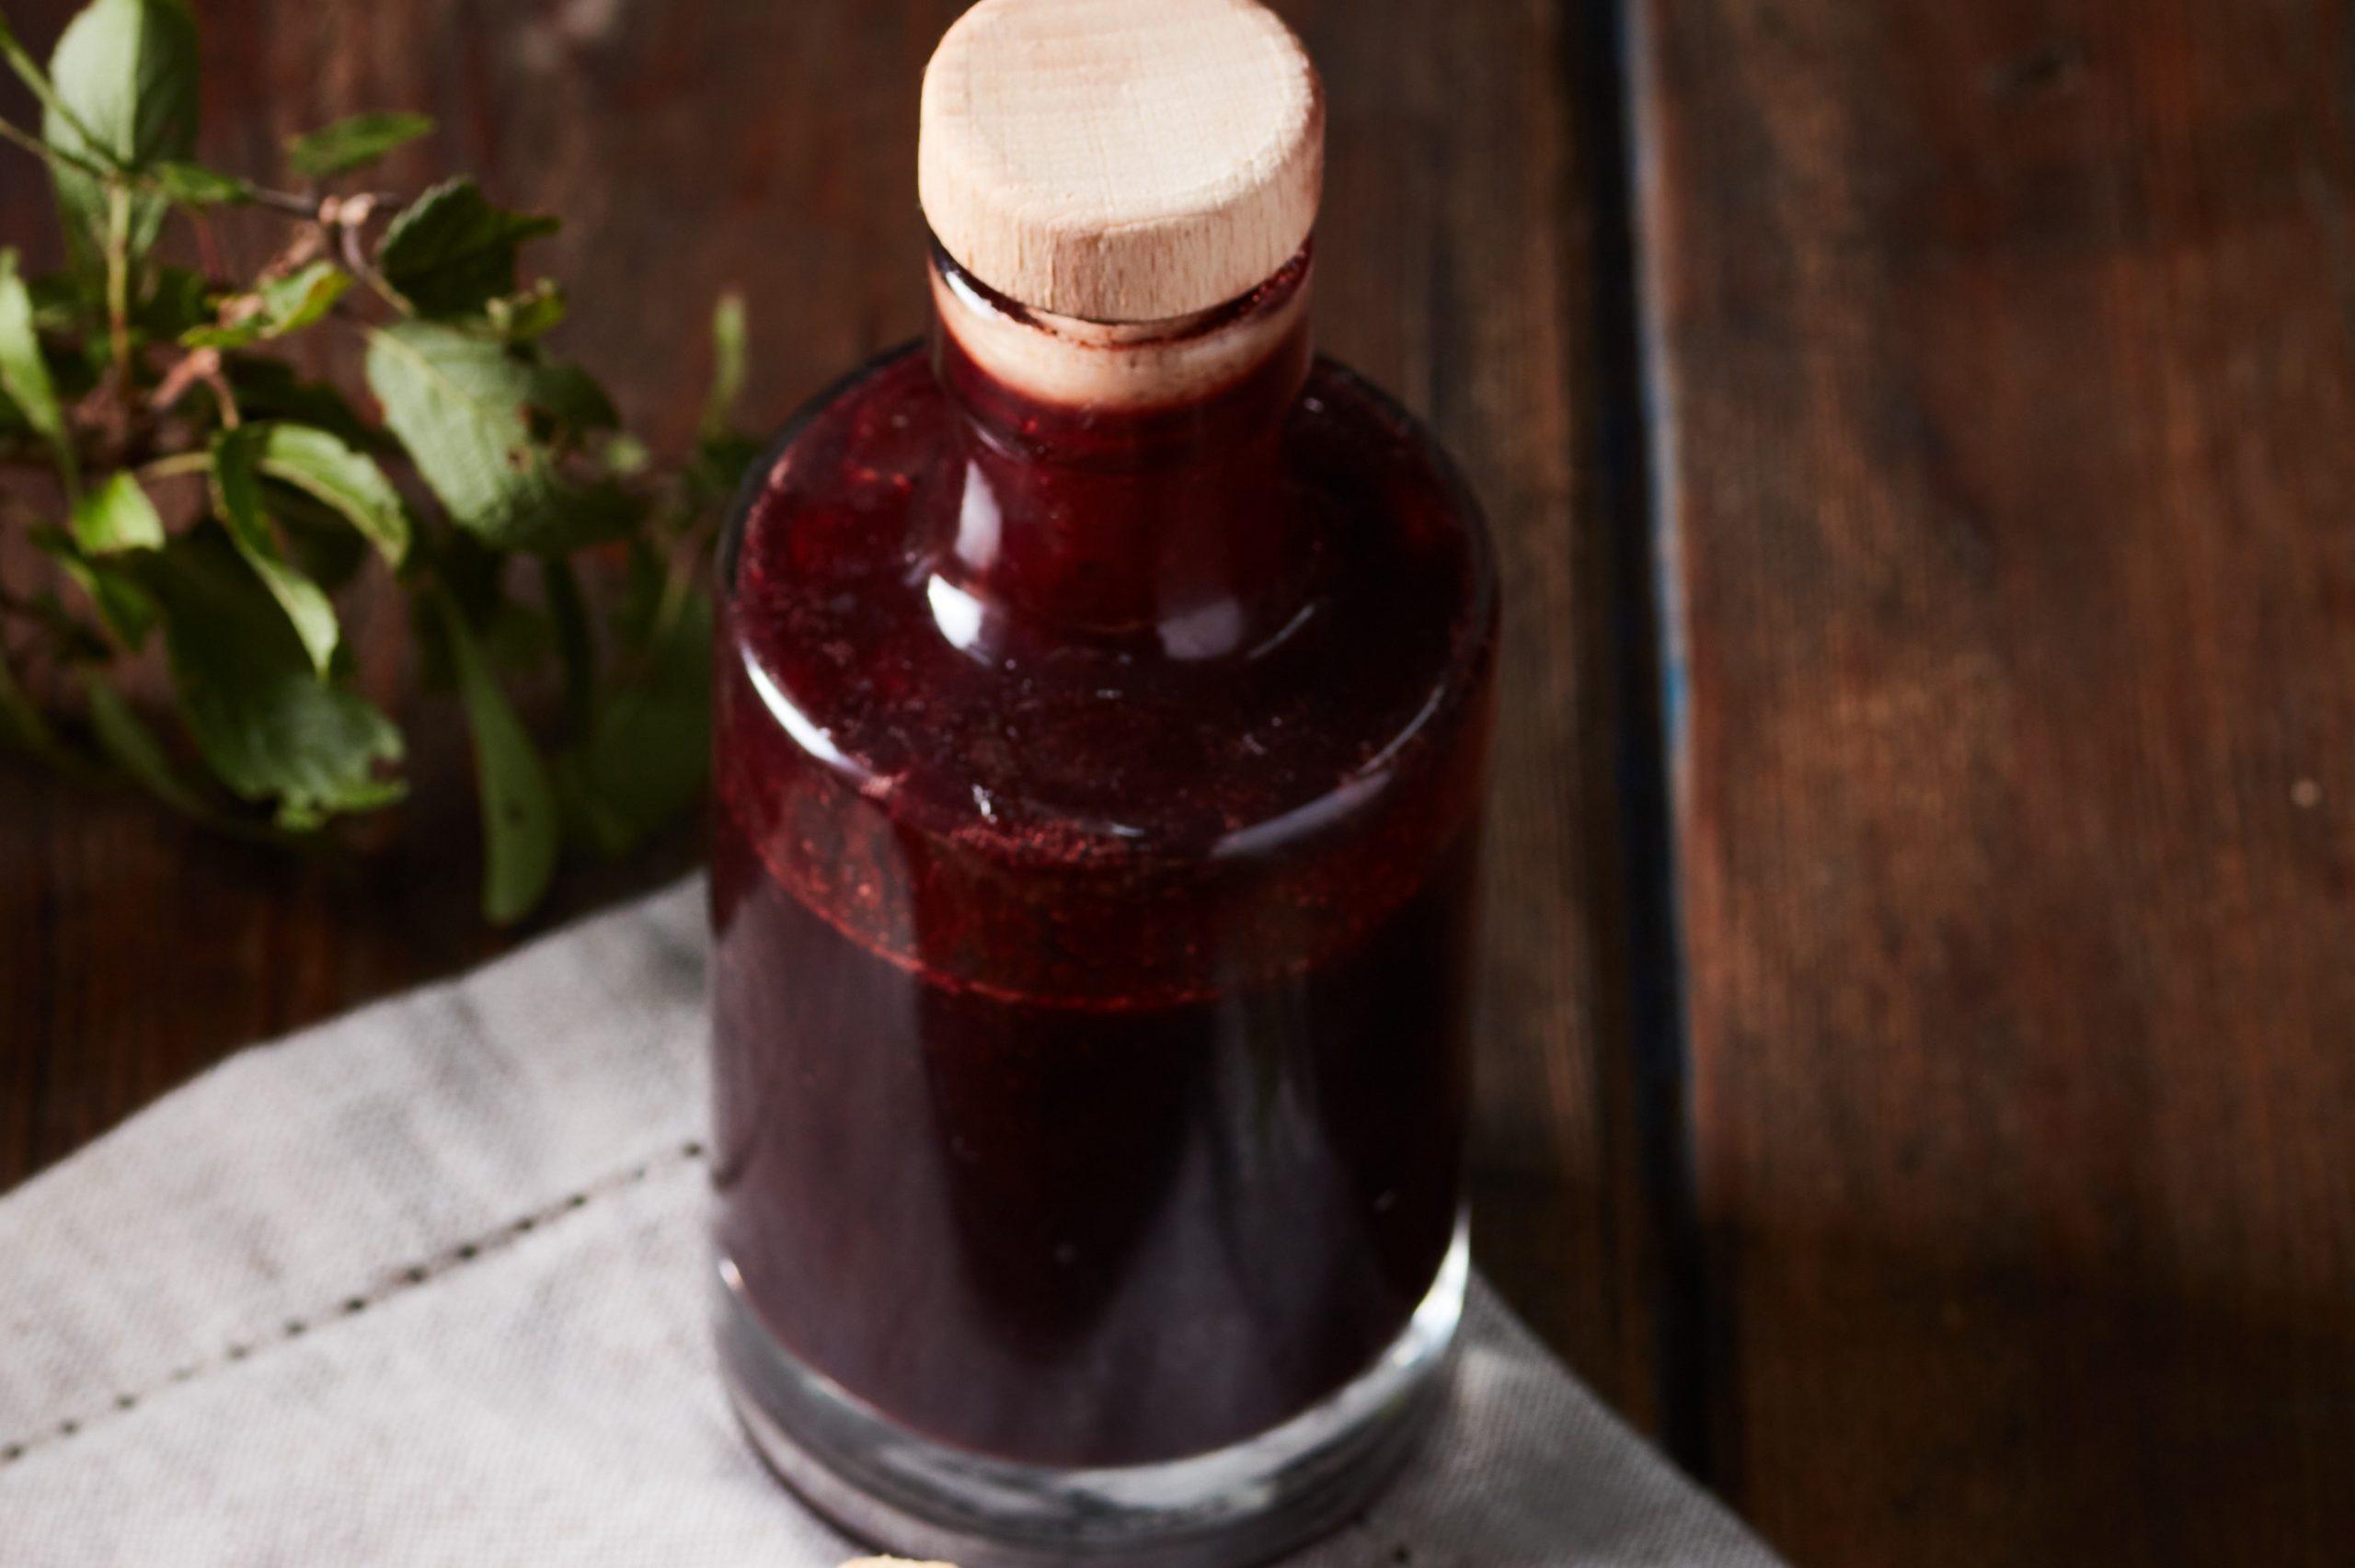 Bottle of homemade sloe syrup